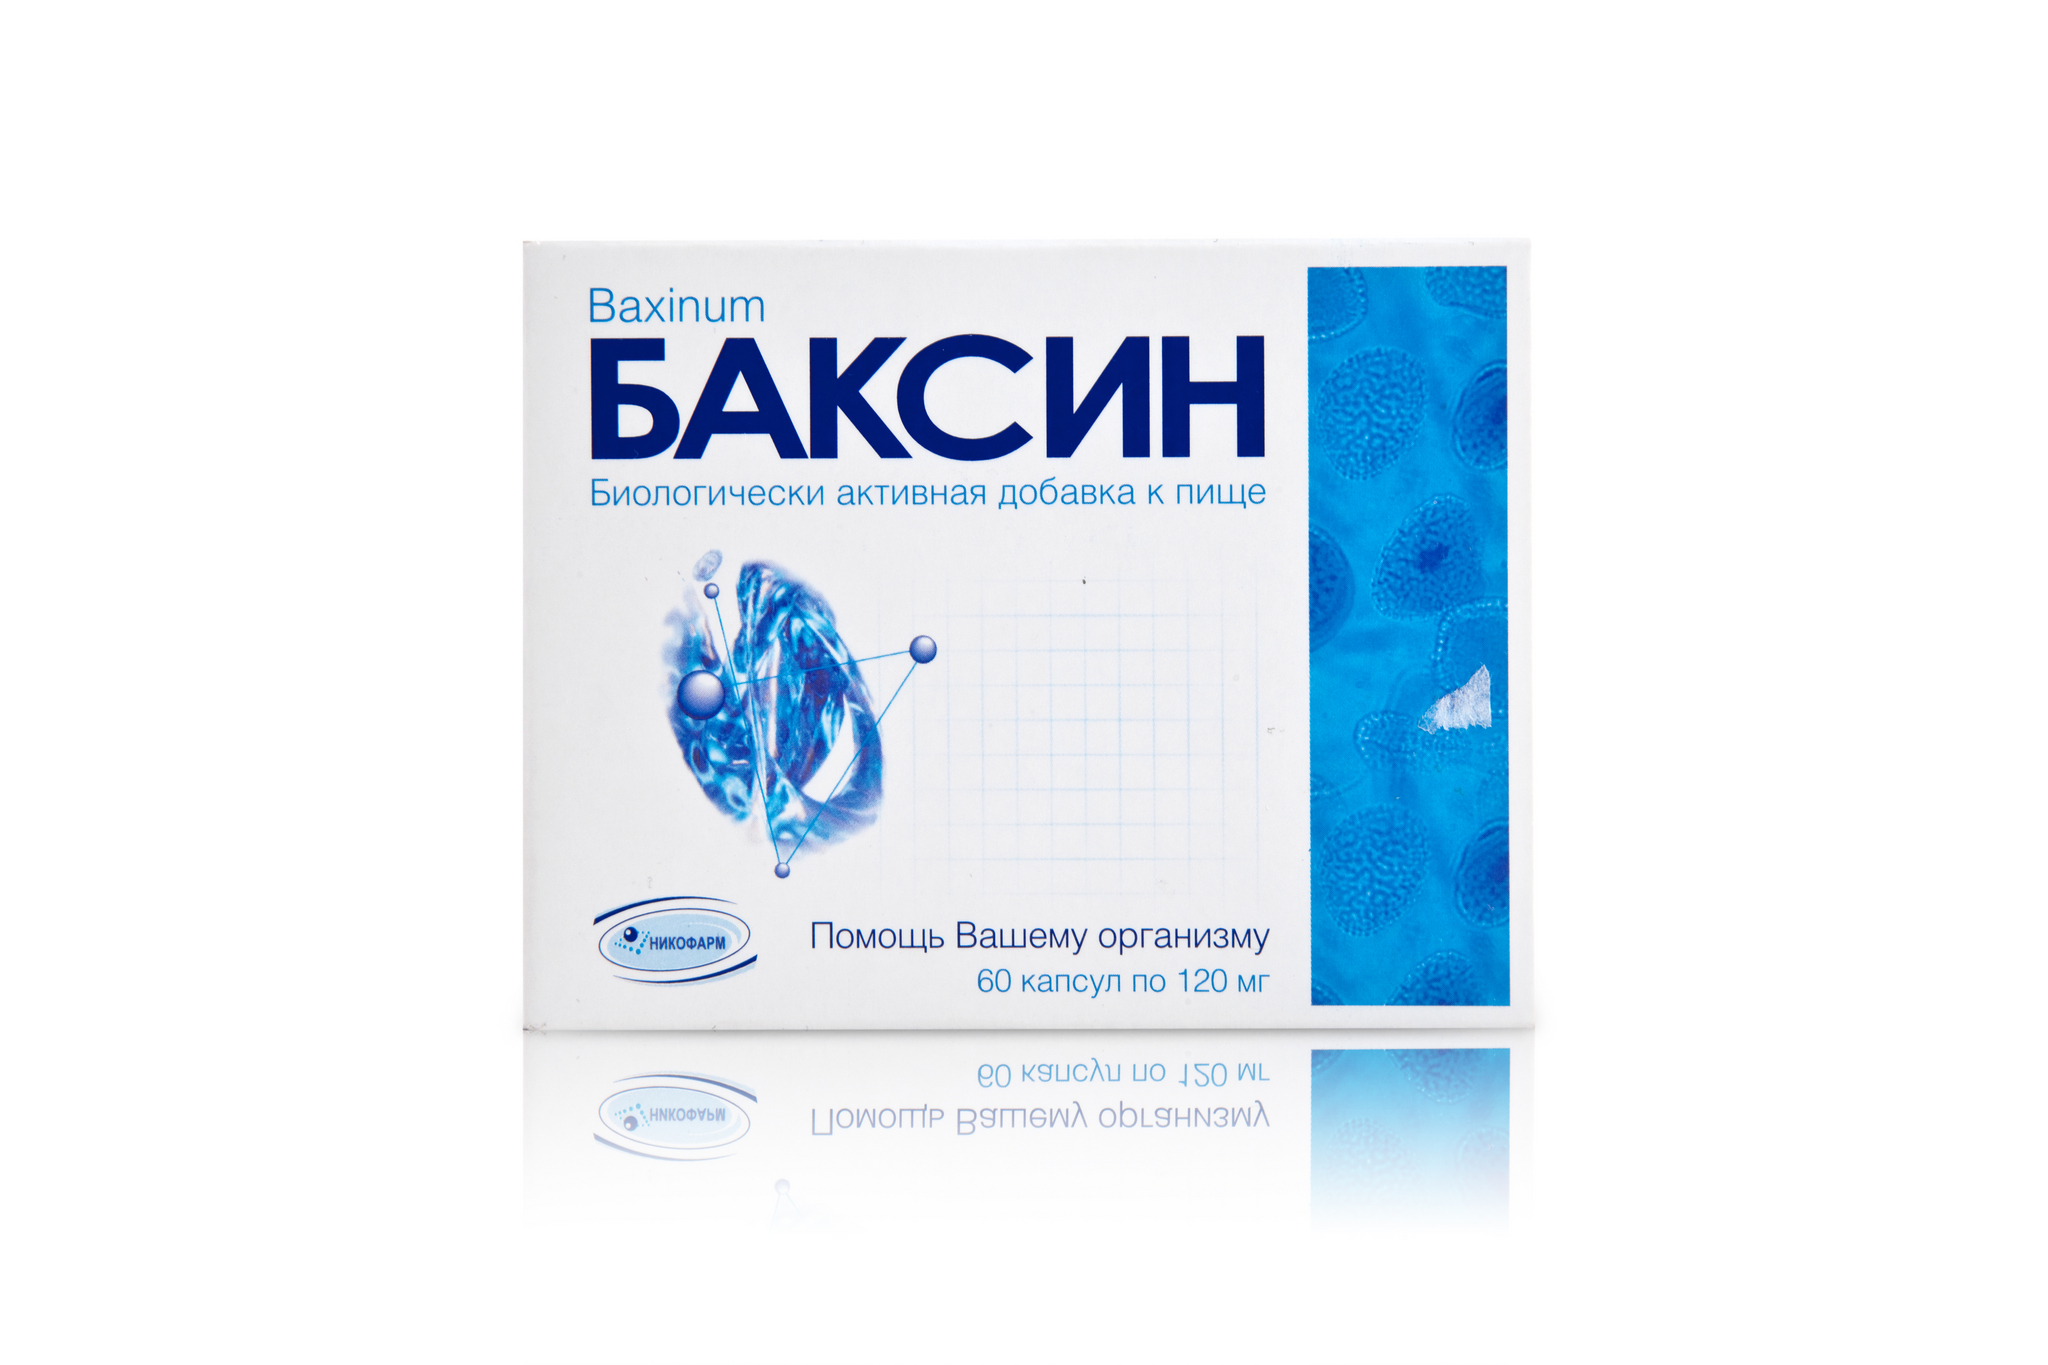 Баксин 60 капсул